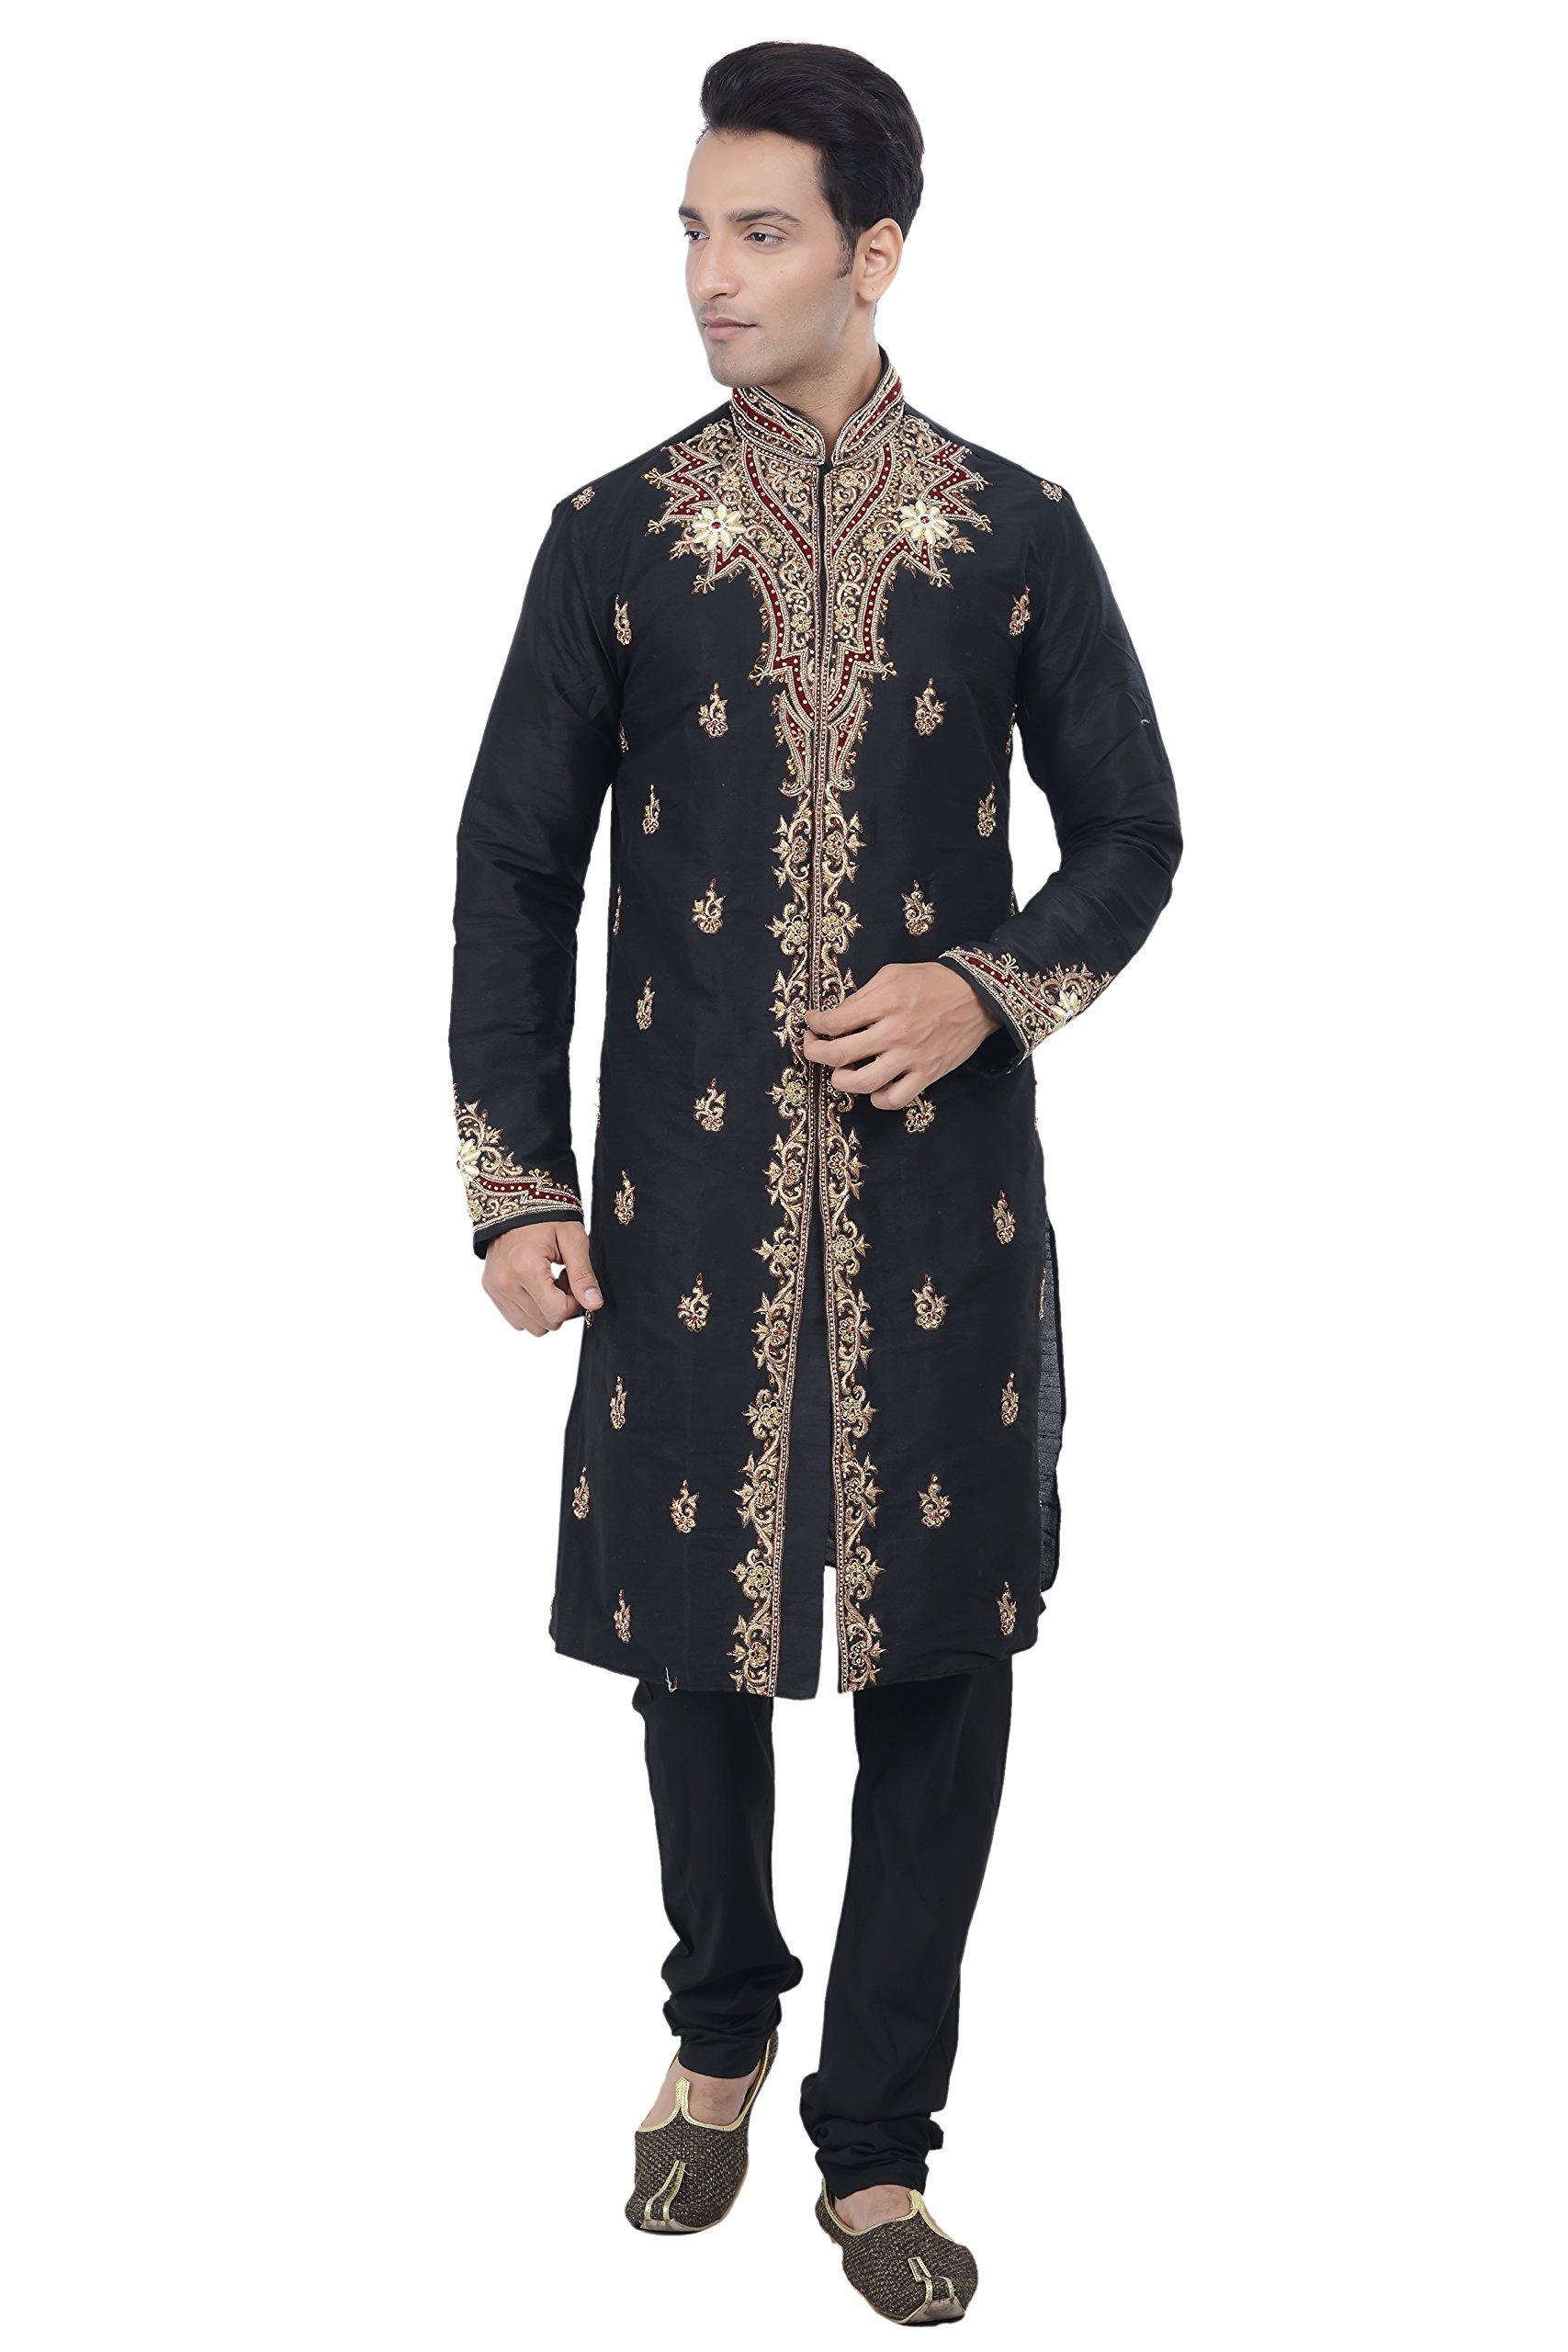 Rajwada Ethnic Indian Design Black Kurta Sherwani for Men 2pc Suit's (M (38))